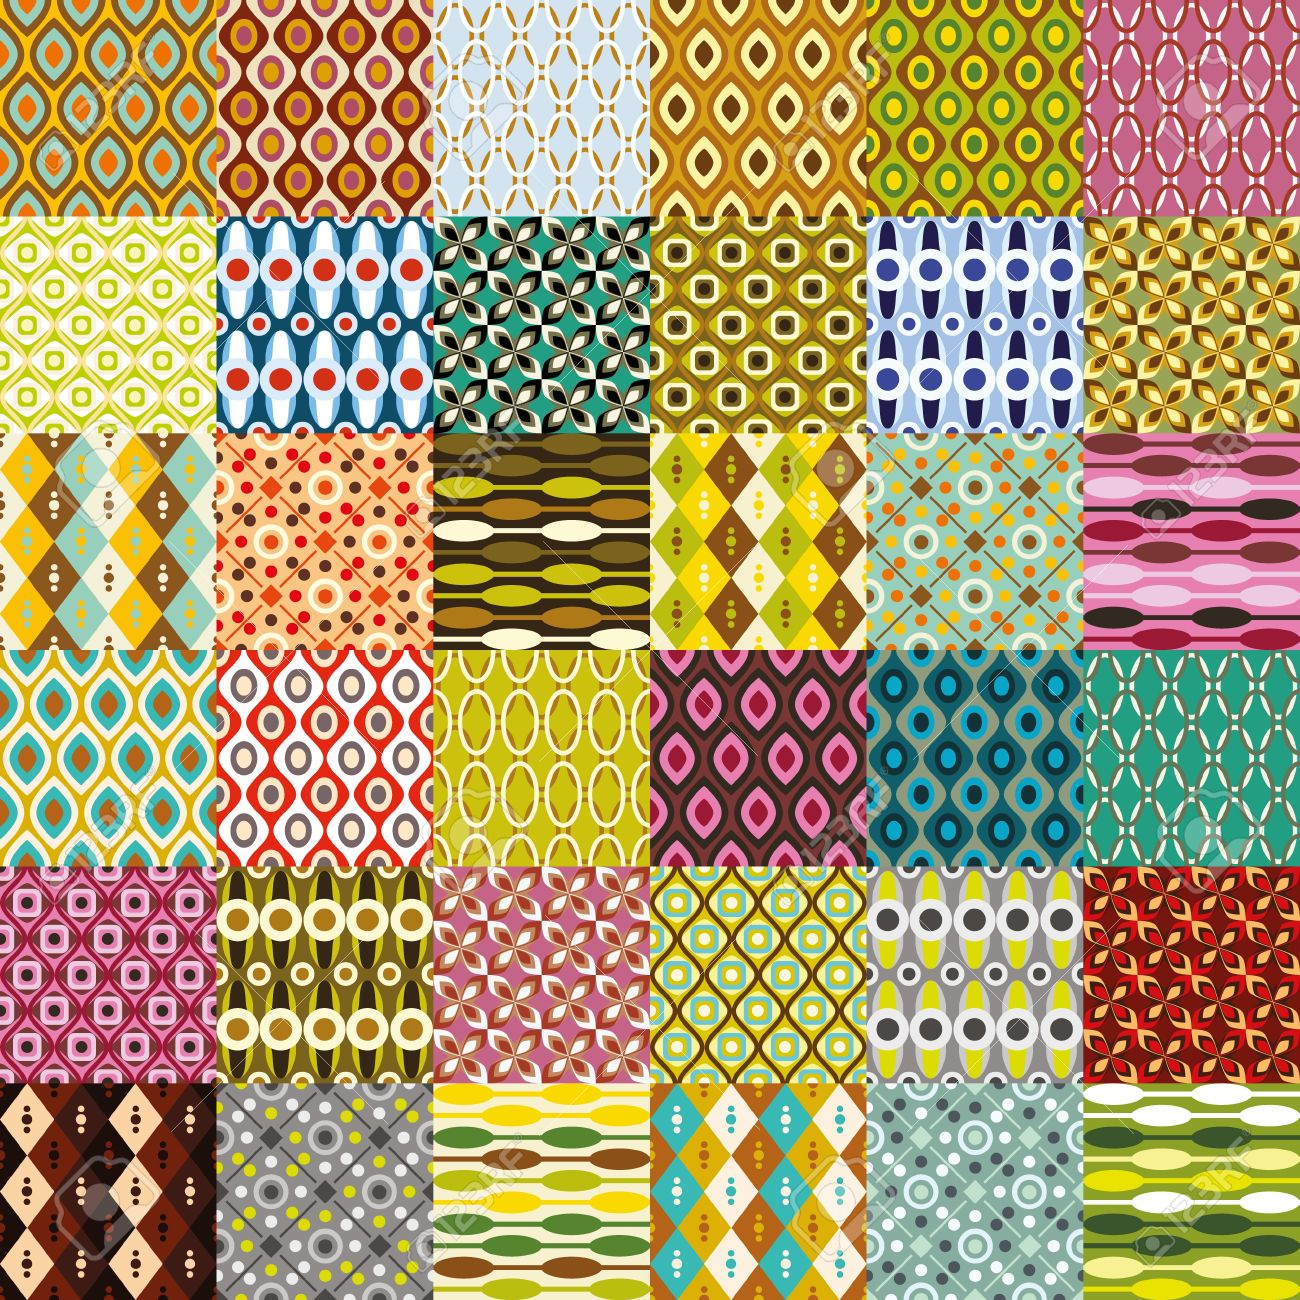 big retro pattern collection - 18001236